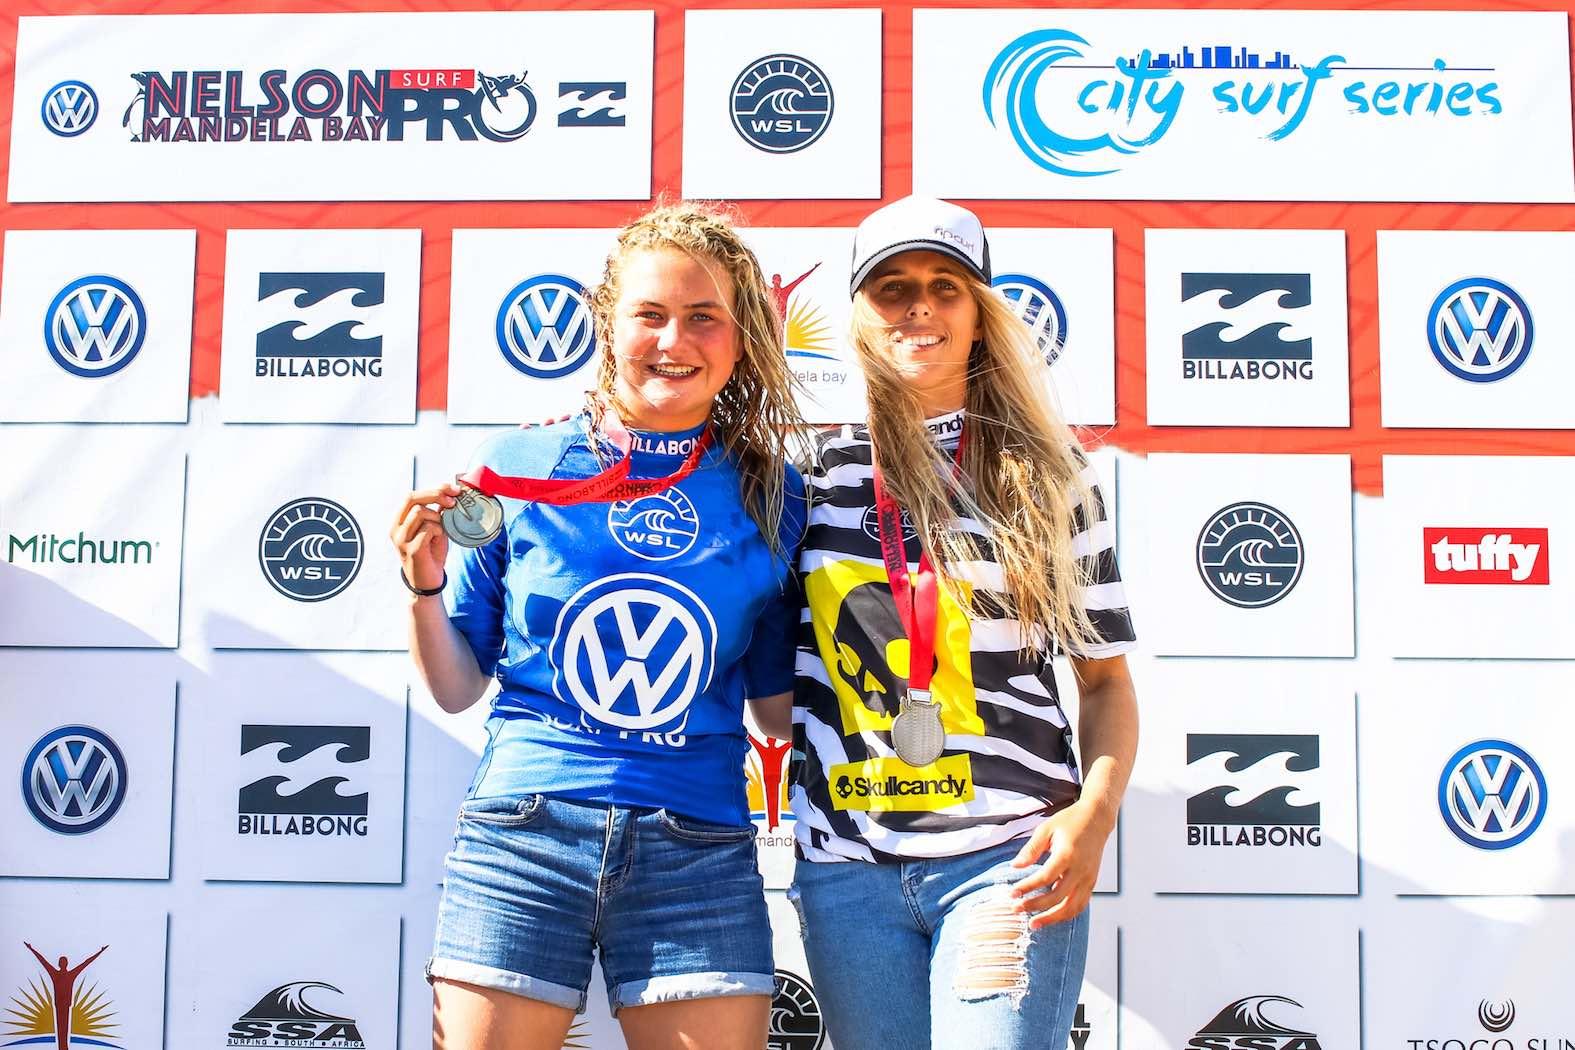 Volkswagen Nelson Mandela Bay Surf Pro Women's final podium